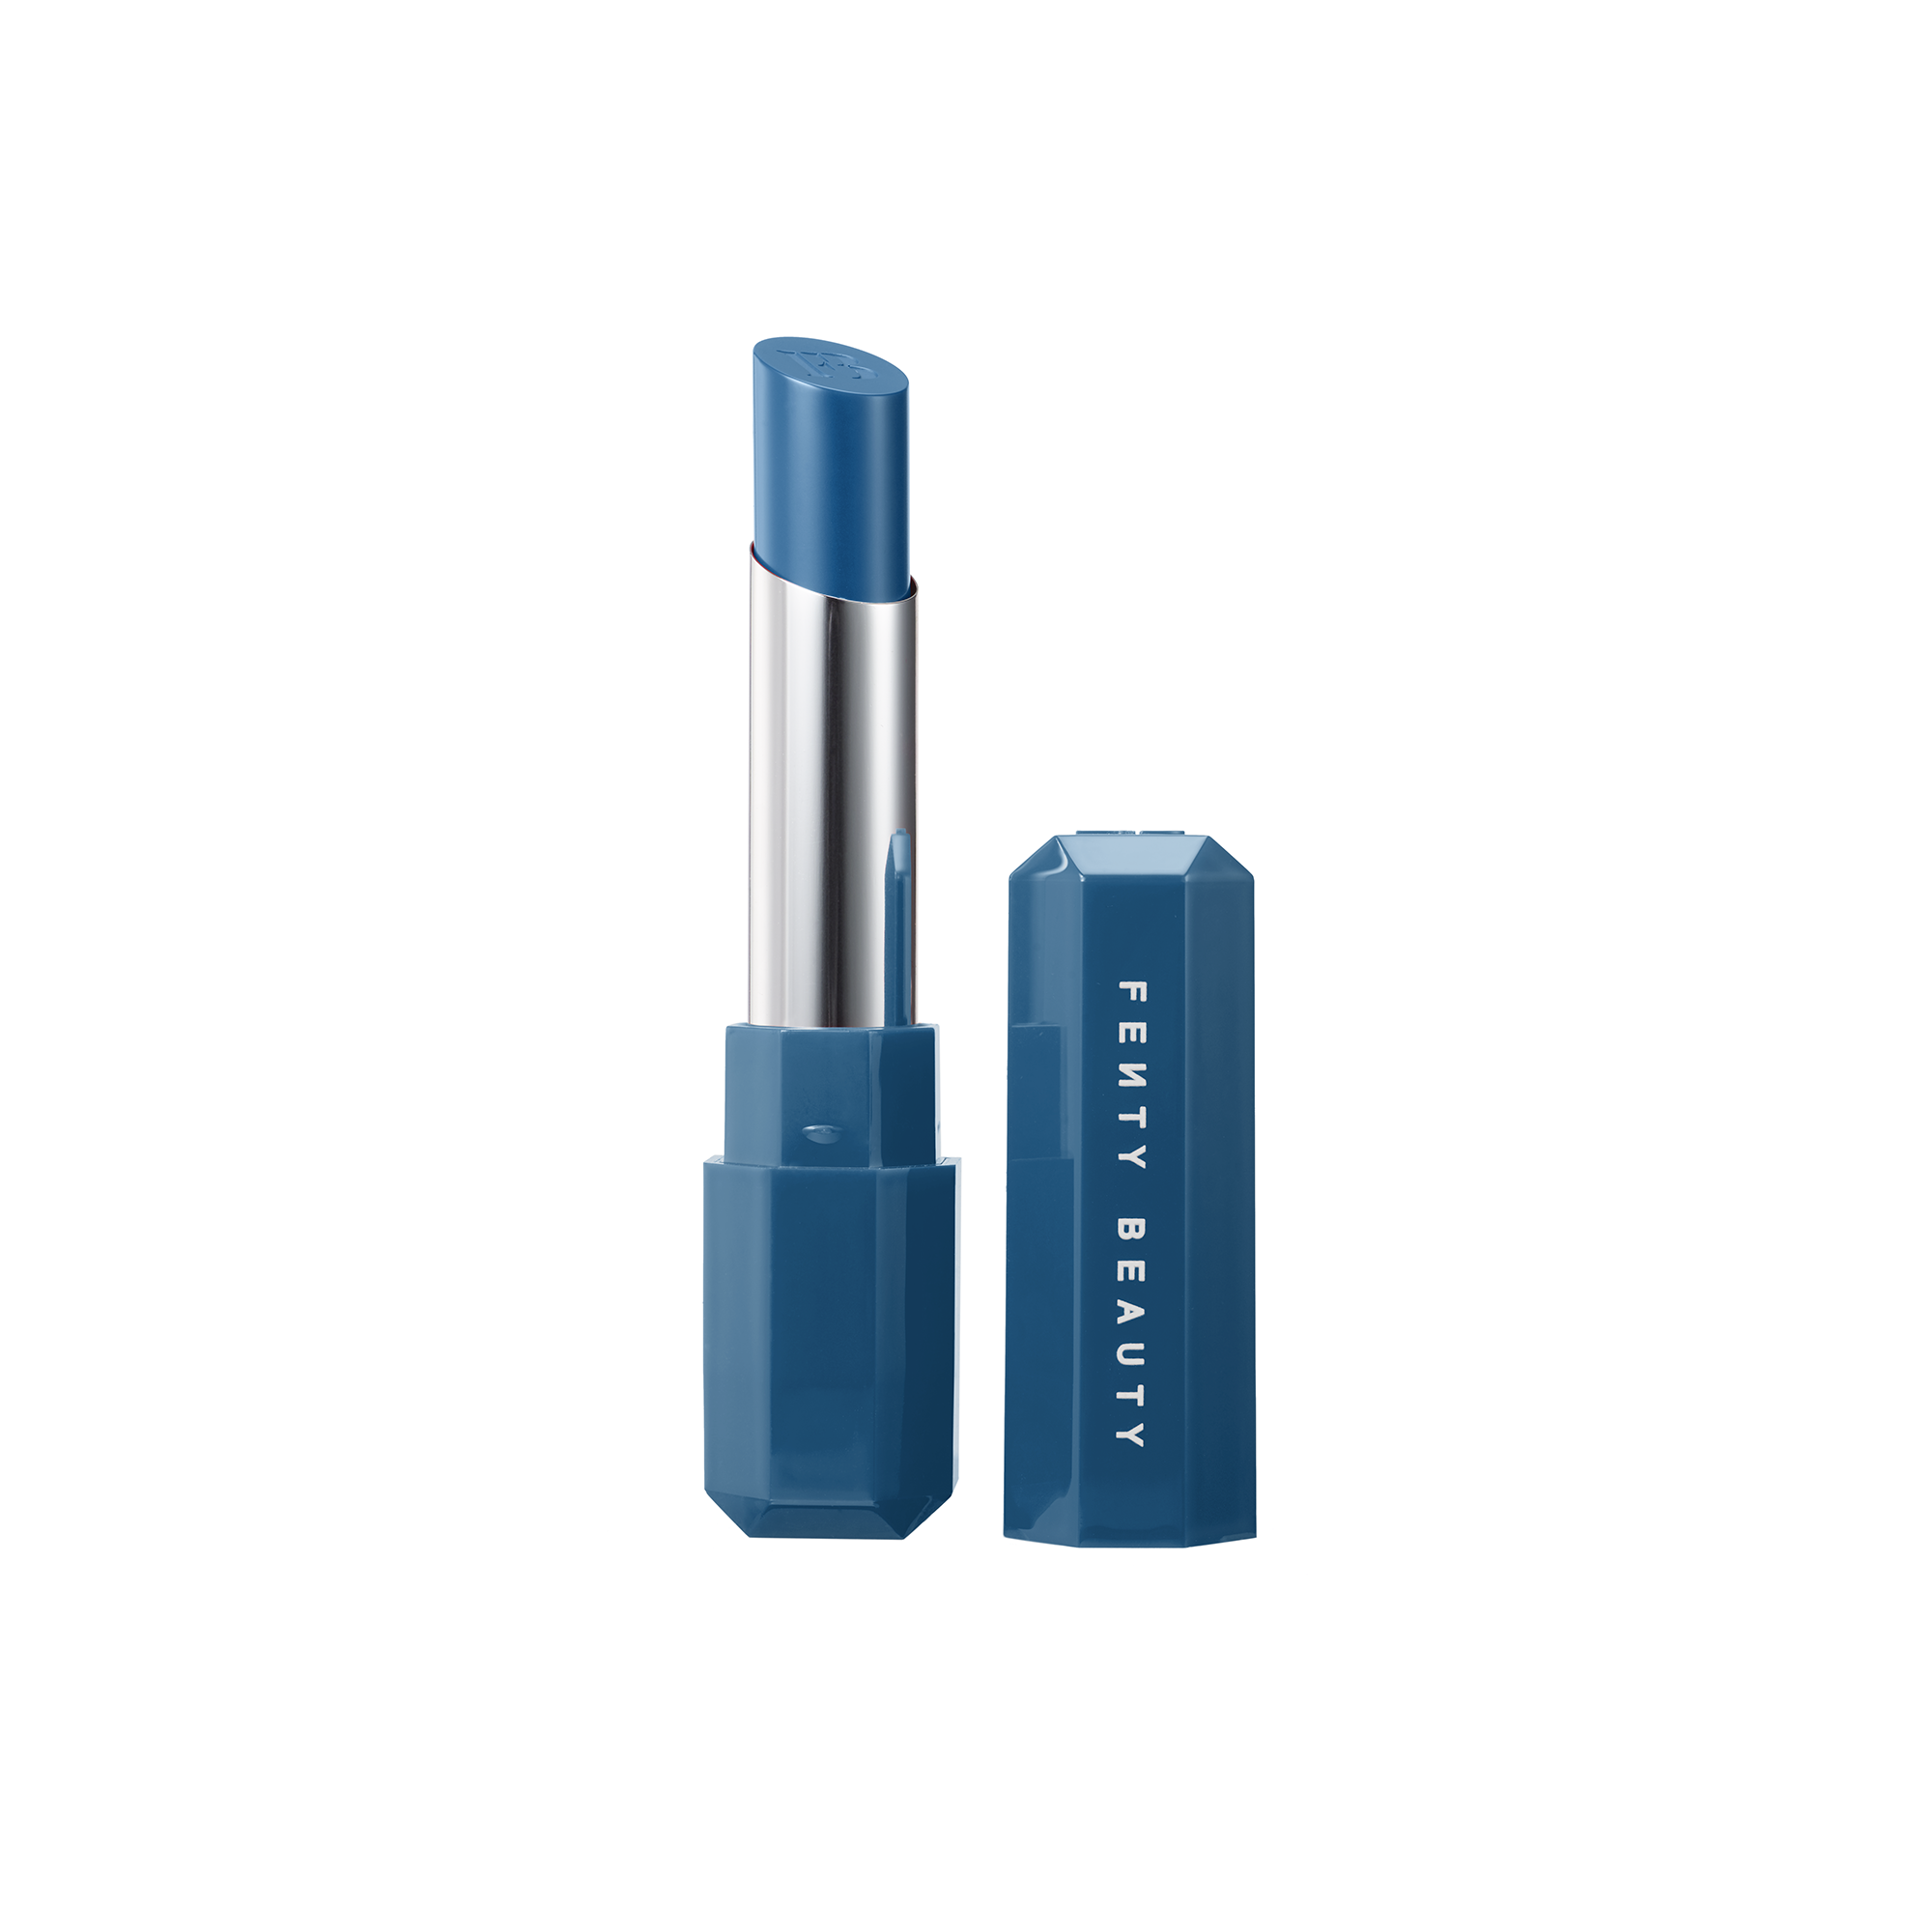 Poutsicle Juicy Satin Lipstick in Go Deep, $32